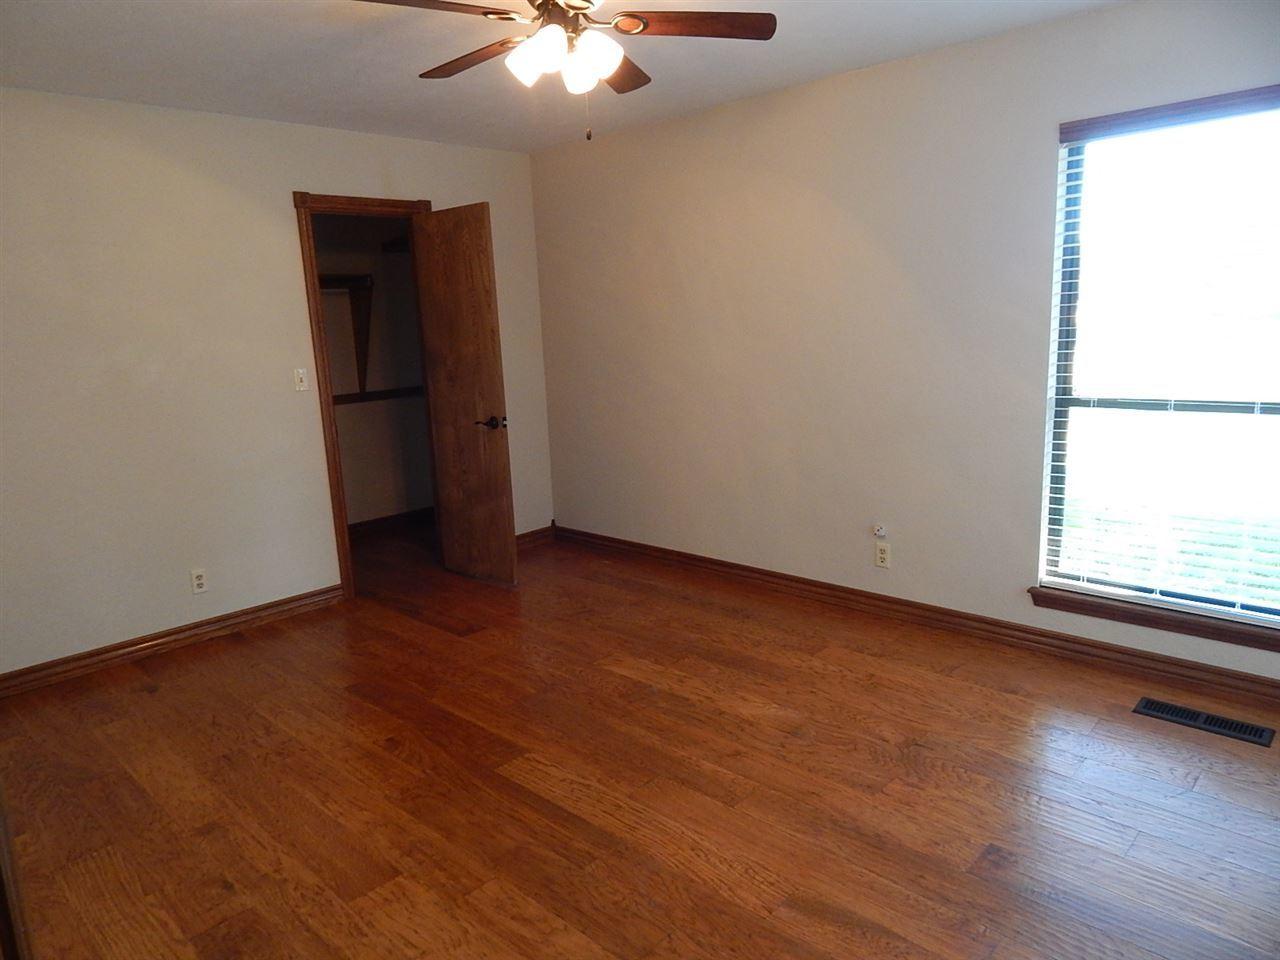 Sold Cross Sale W/ MLS | 3609 Wellington Ponca City, OK 74604 13